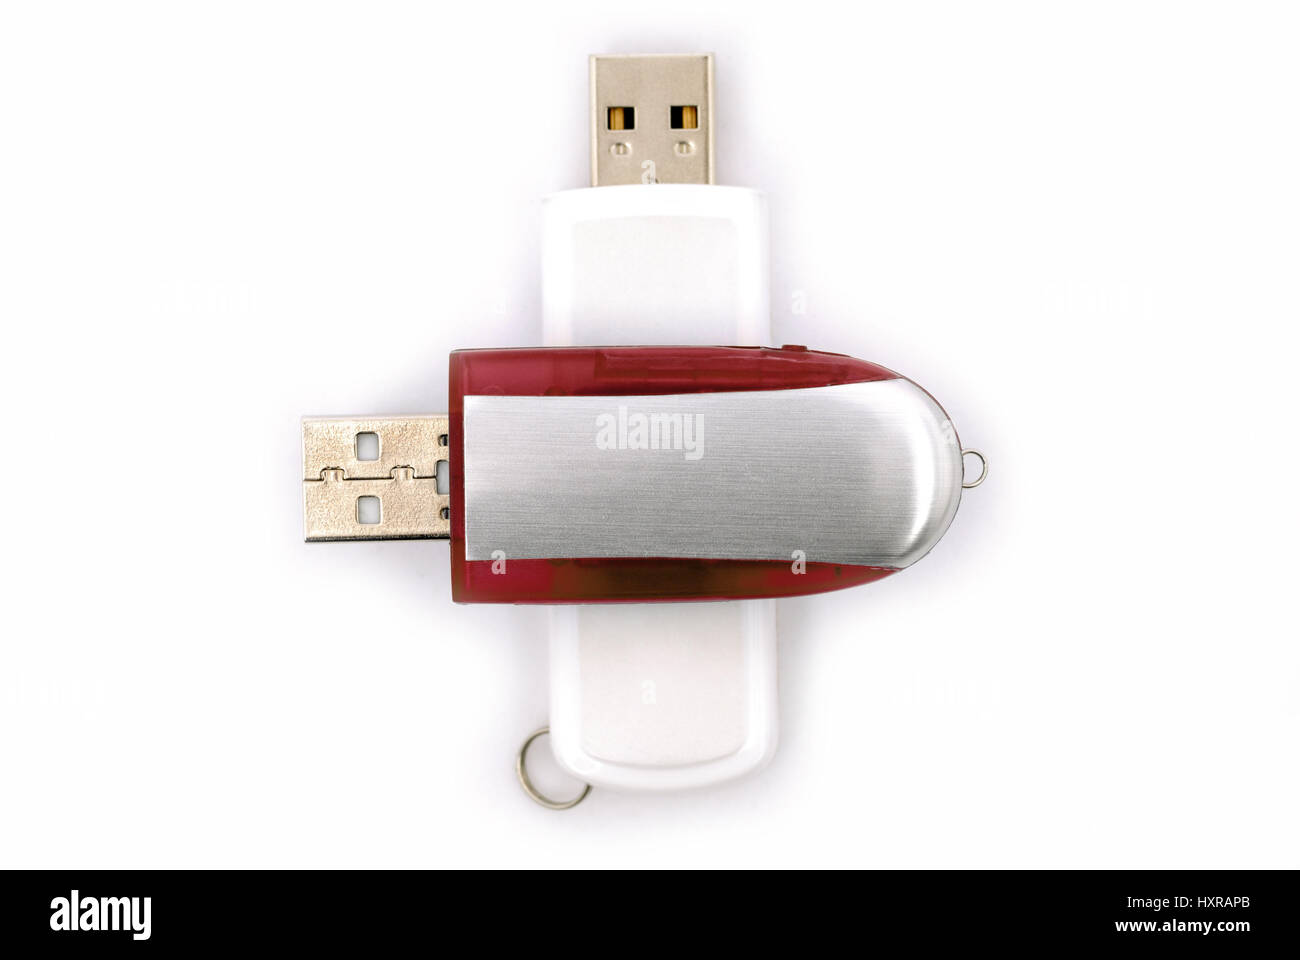 USB-Stick, USB-Sticks, Datenträger, Memory-Stick, USB-Sticks, Daten ...